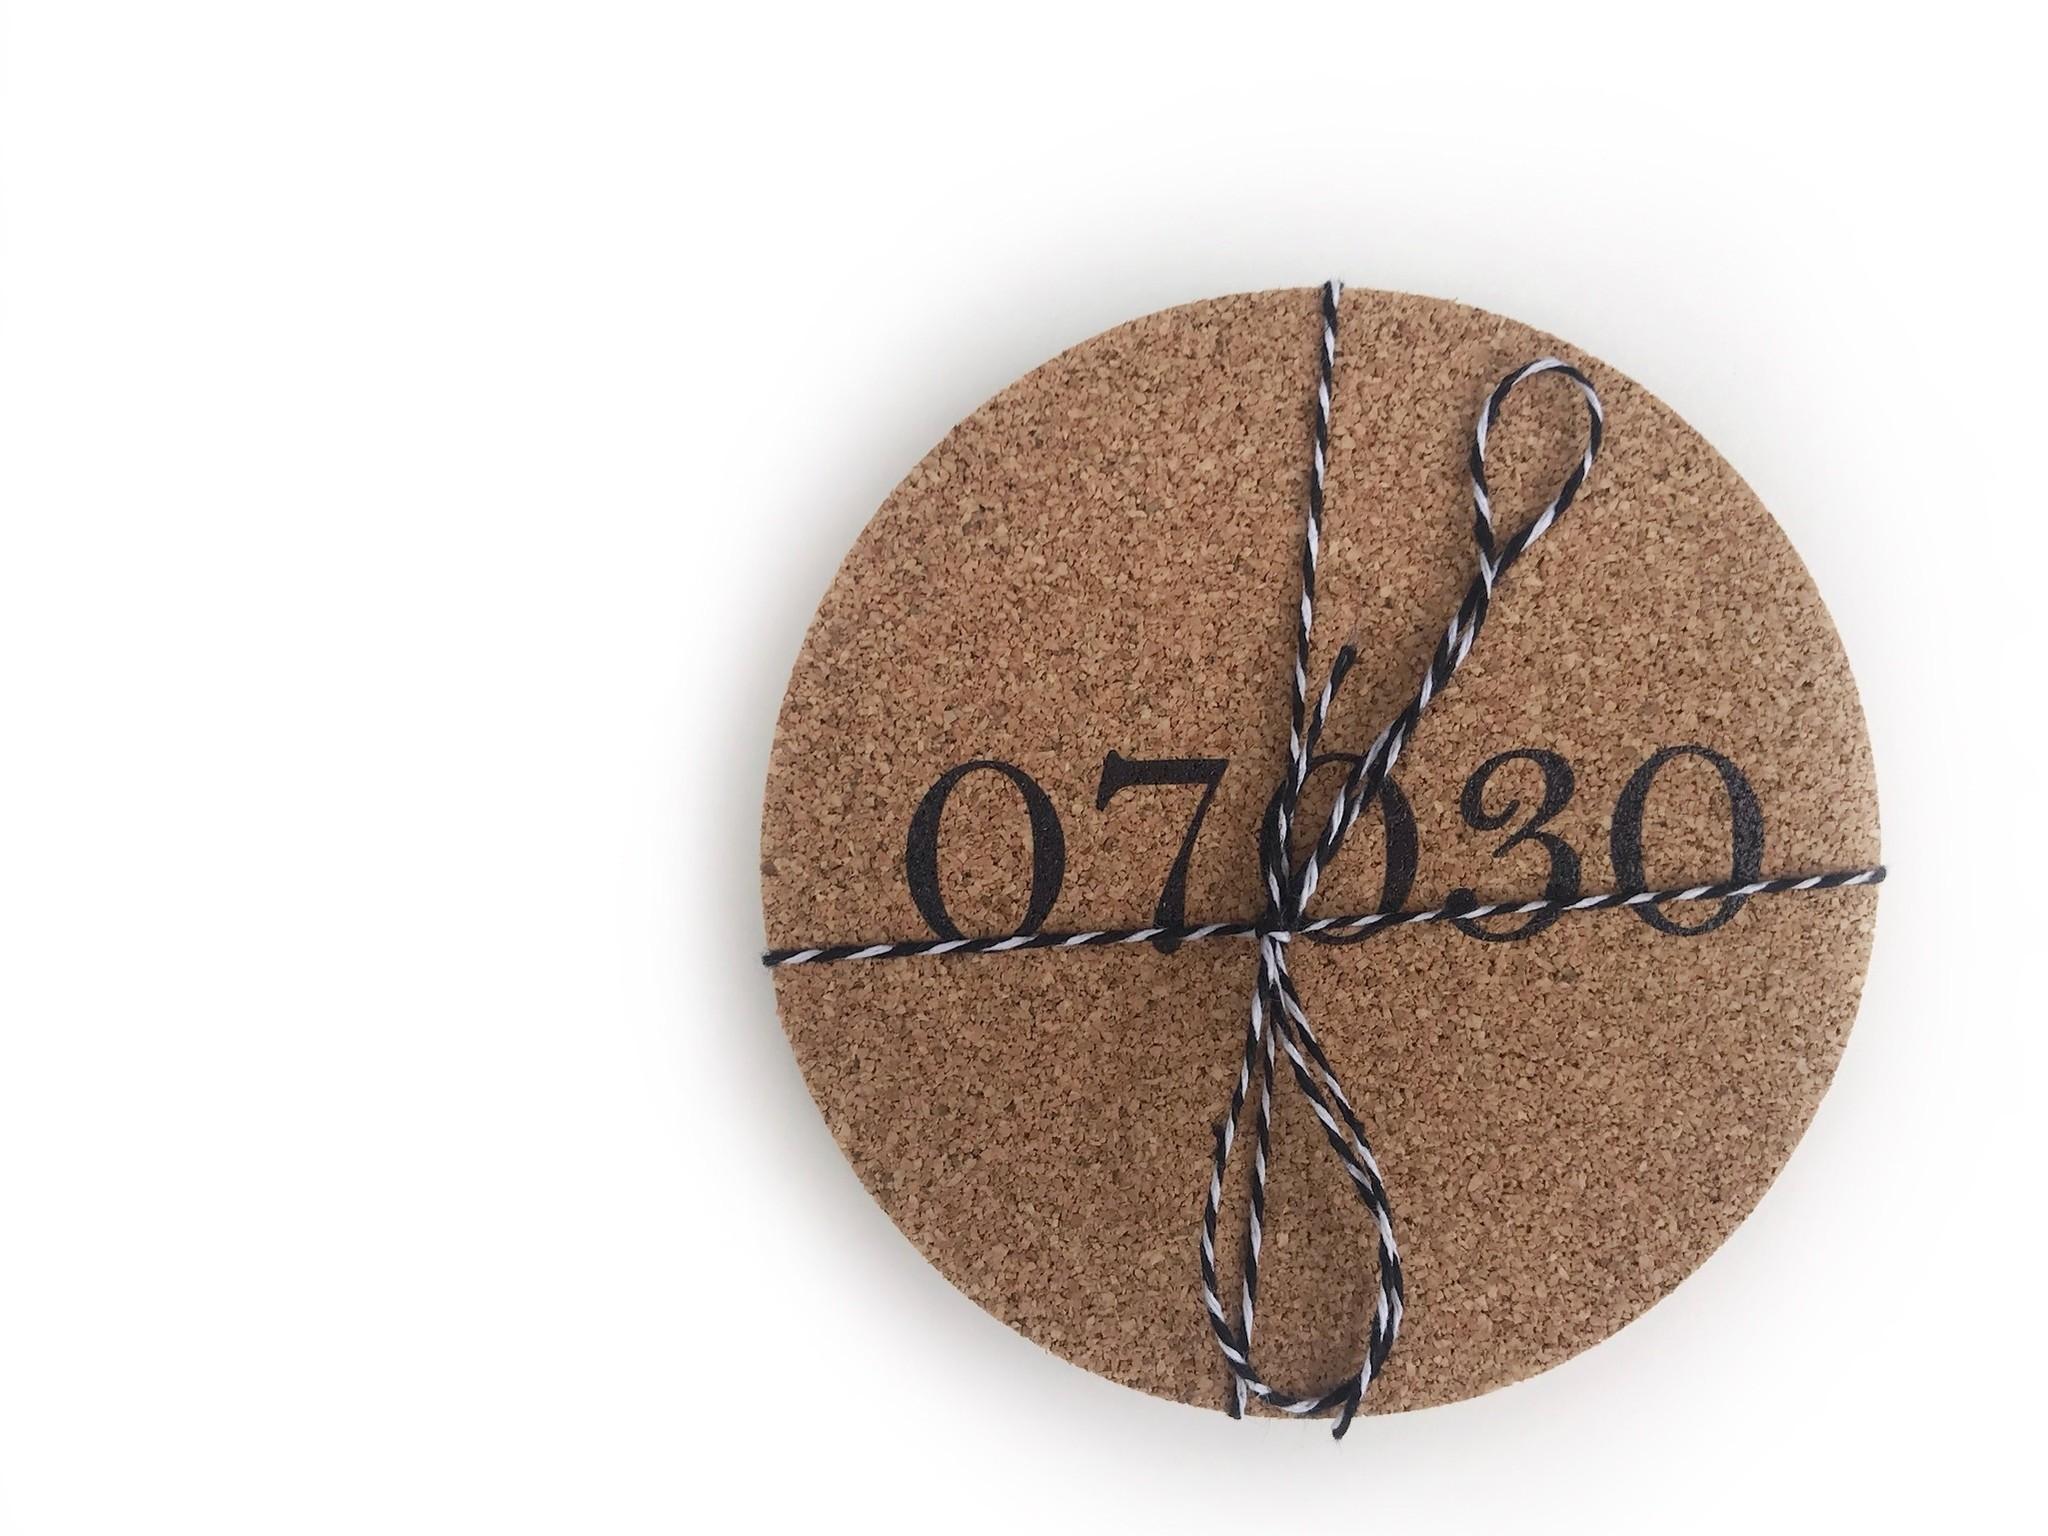 4imprint 07030 Cork Coaster Set (4)